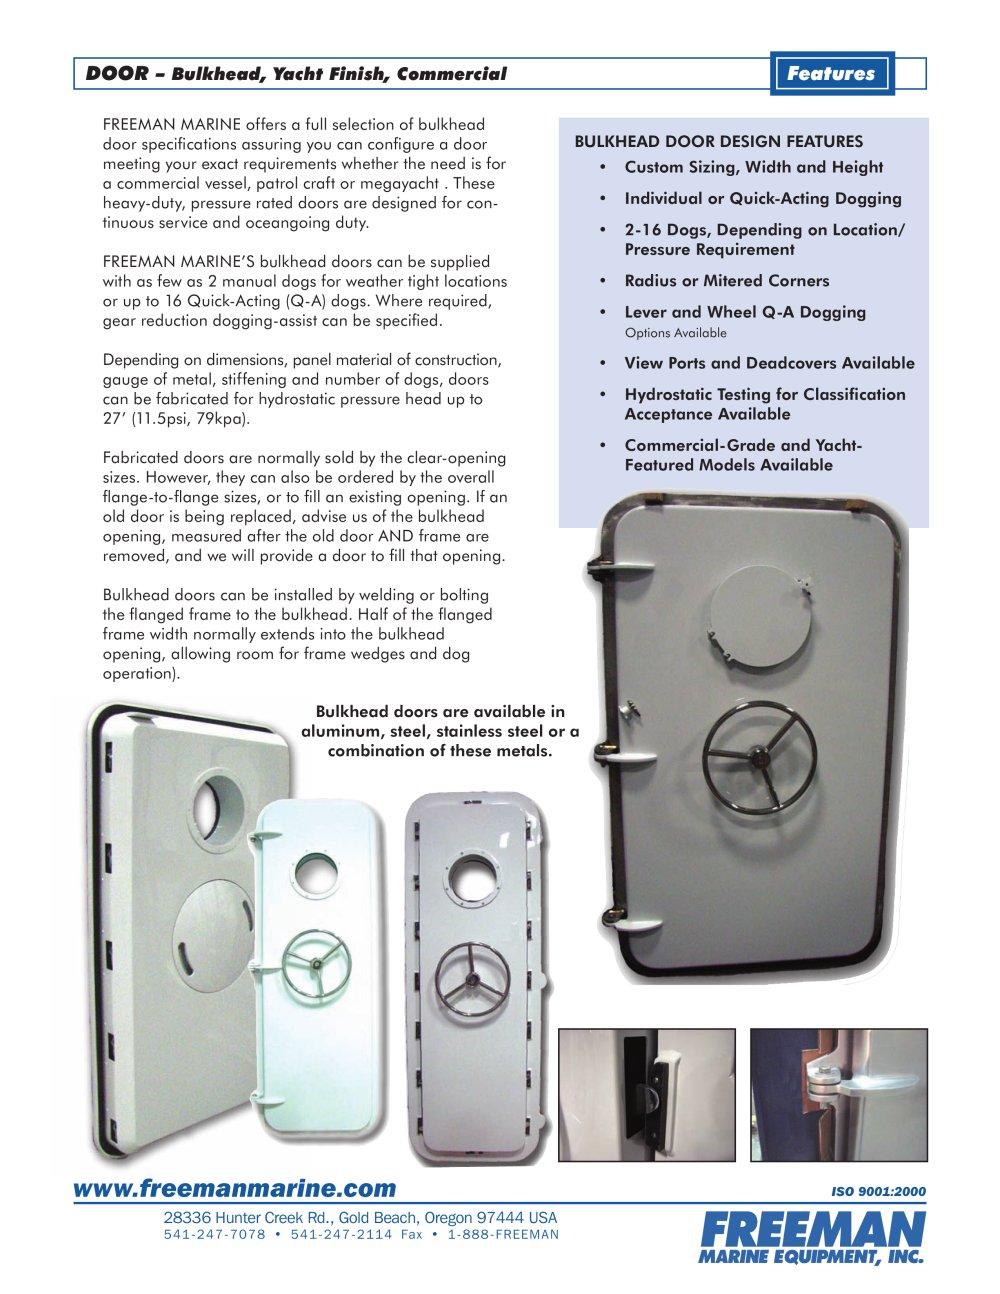 BULKHEAD DOORS - 1 / 2 Pages  sc 1 st  Catalogues Nauticexpo & BULKHEAD DOORS - Freeman Marine Equipment - PDF Catalogues ...